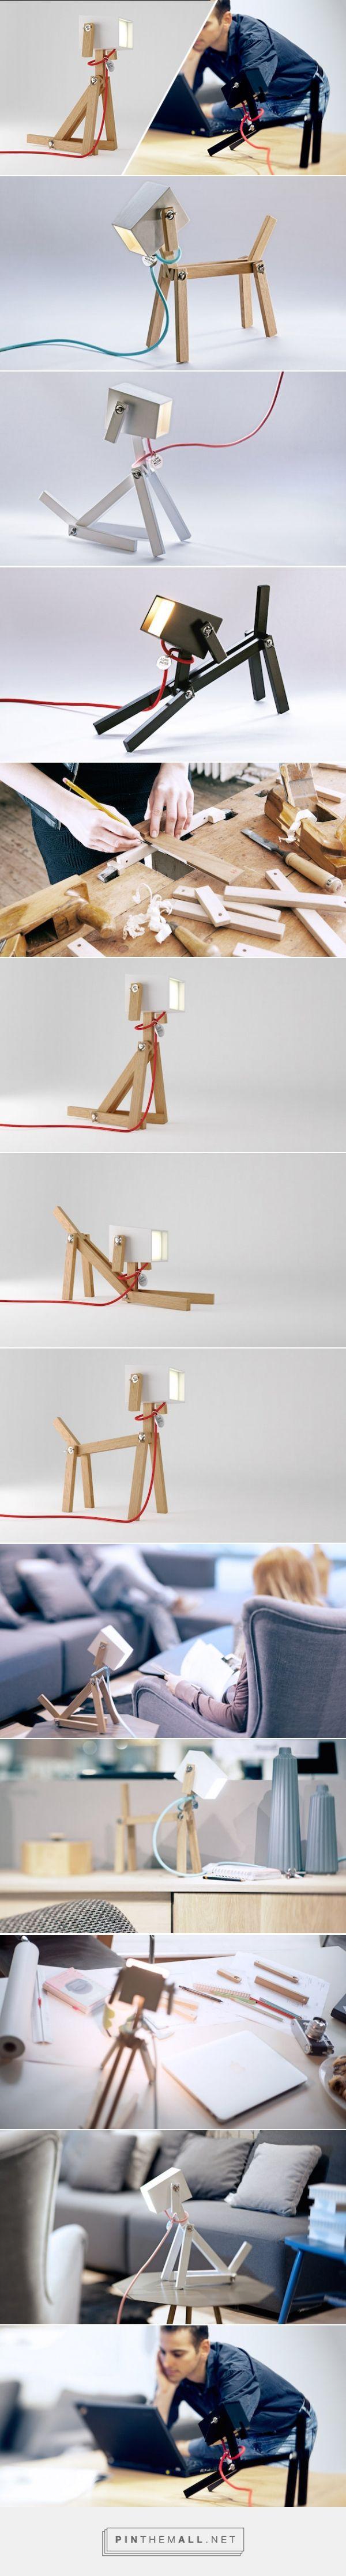 Luminose Lamp | Zimmerer and Lente | Feel Desain - created via http://pinthemall.net